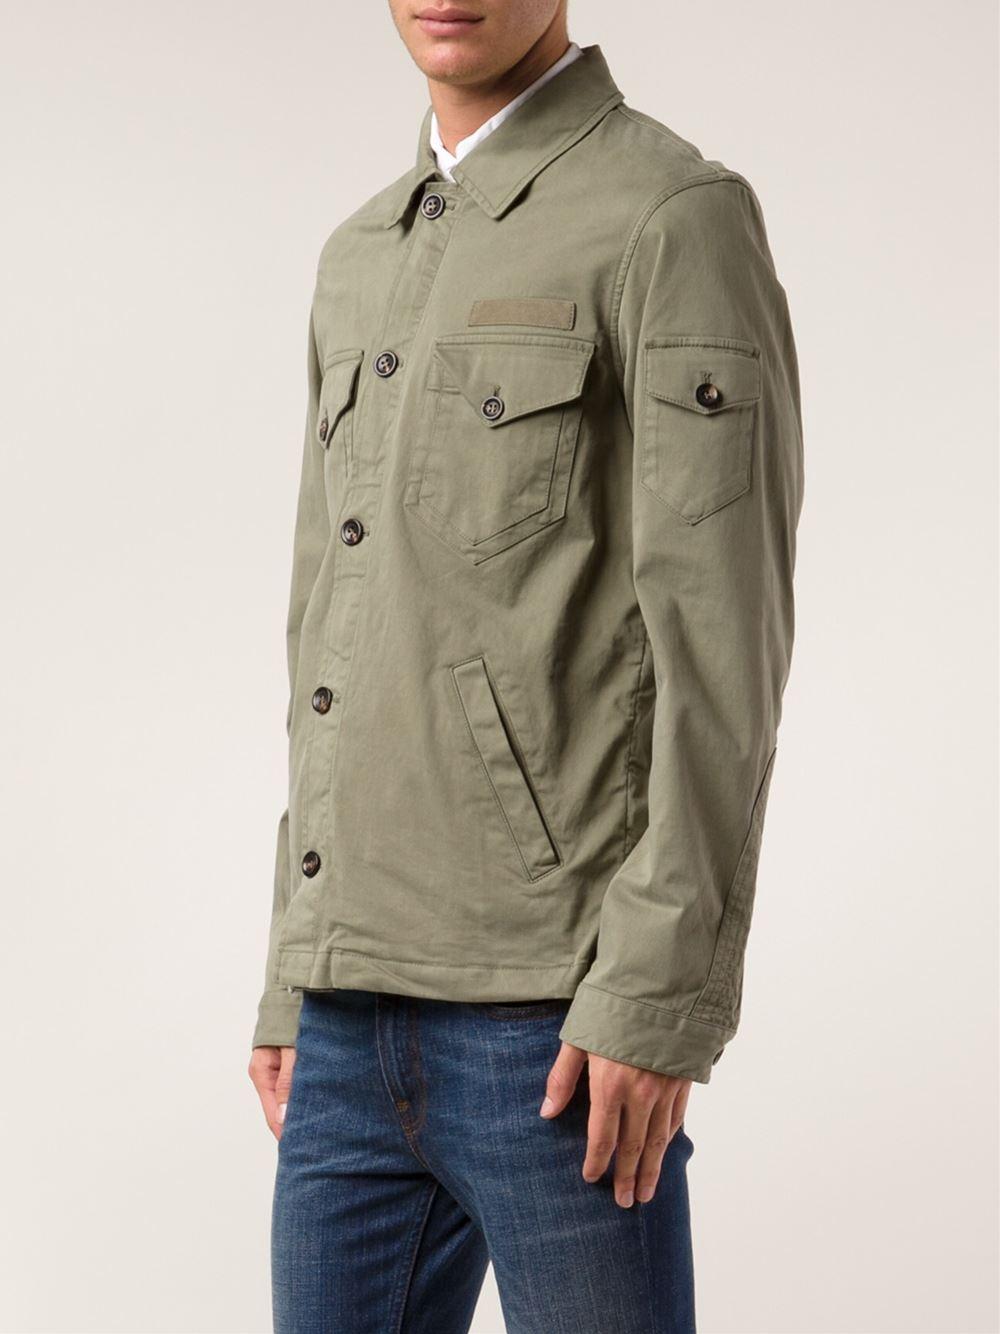 Army Shirt Jacket Fit Jacket